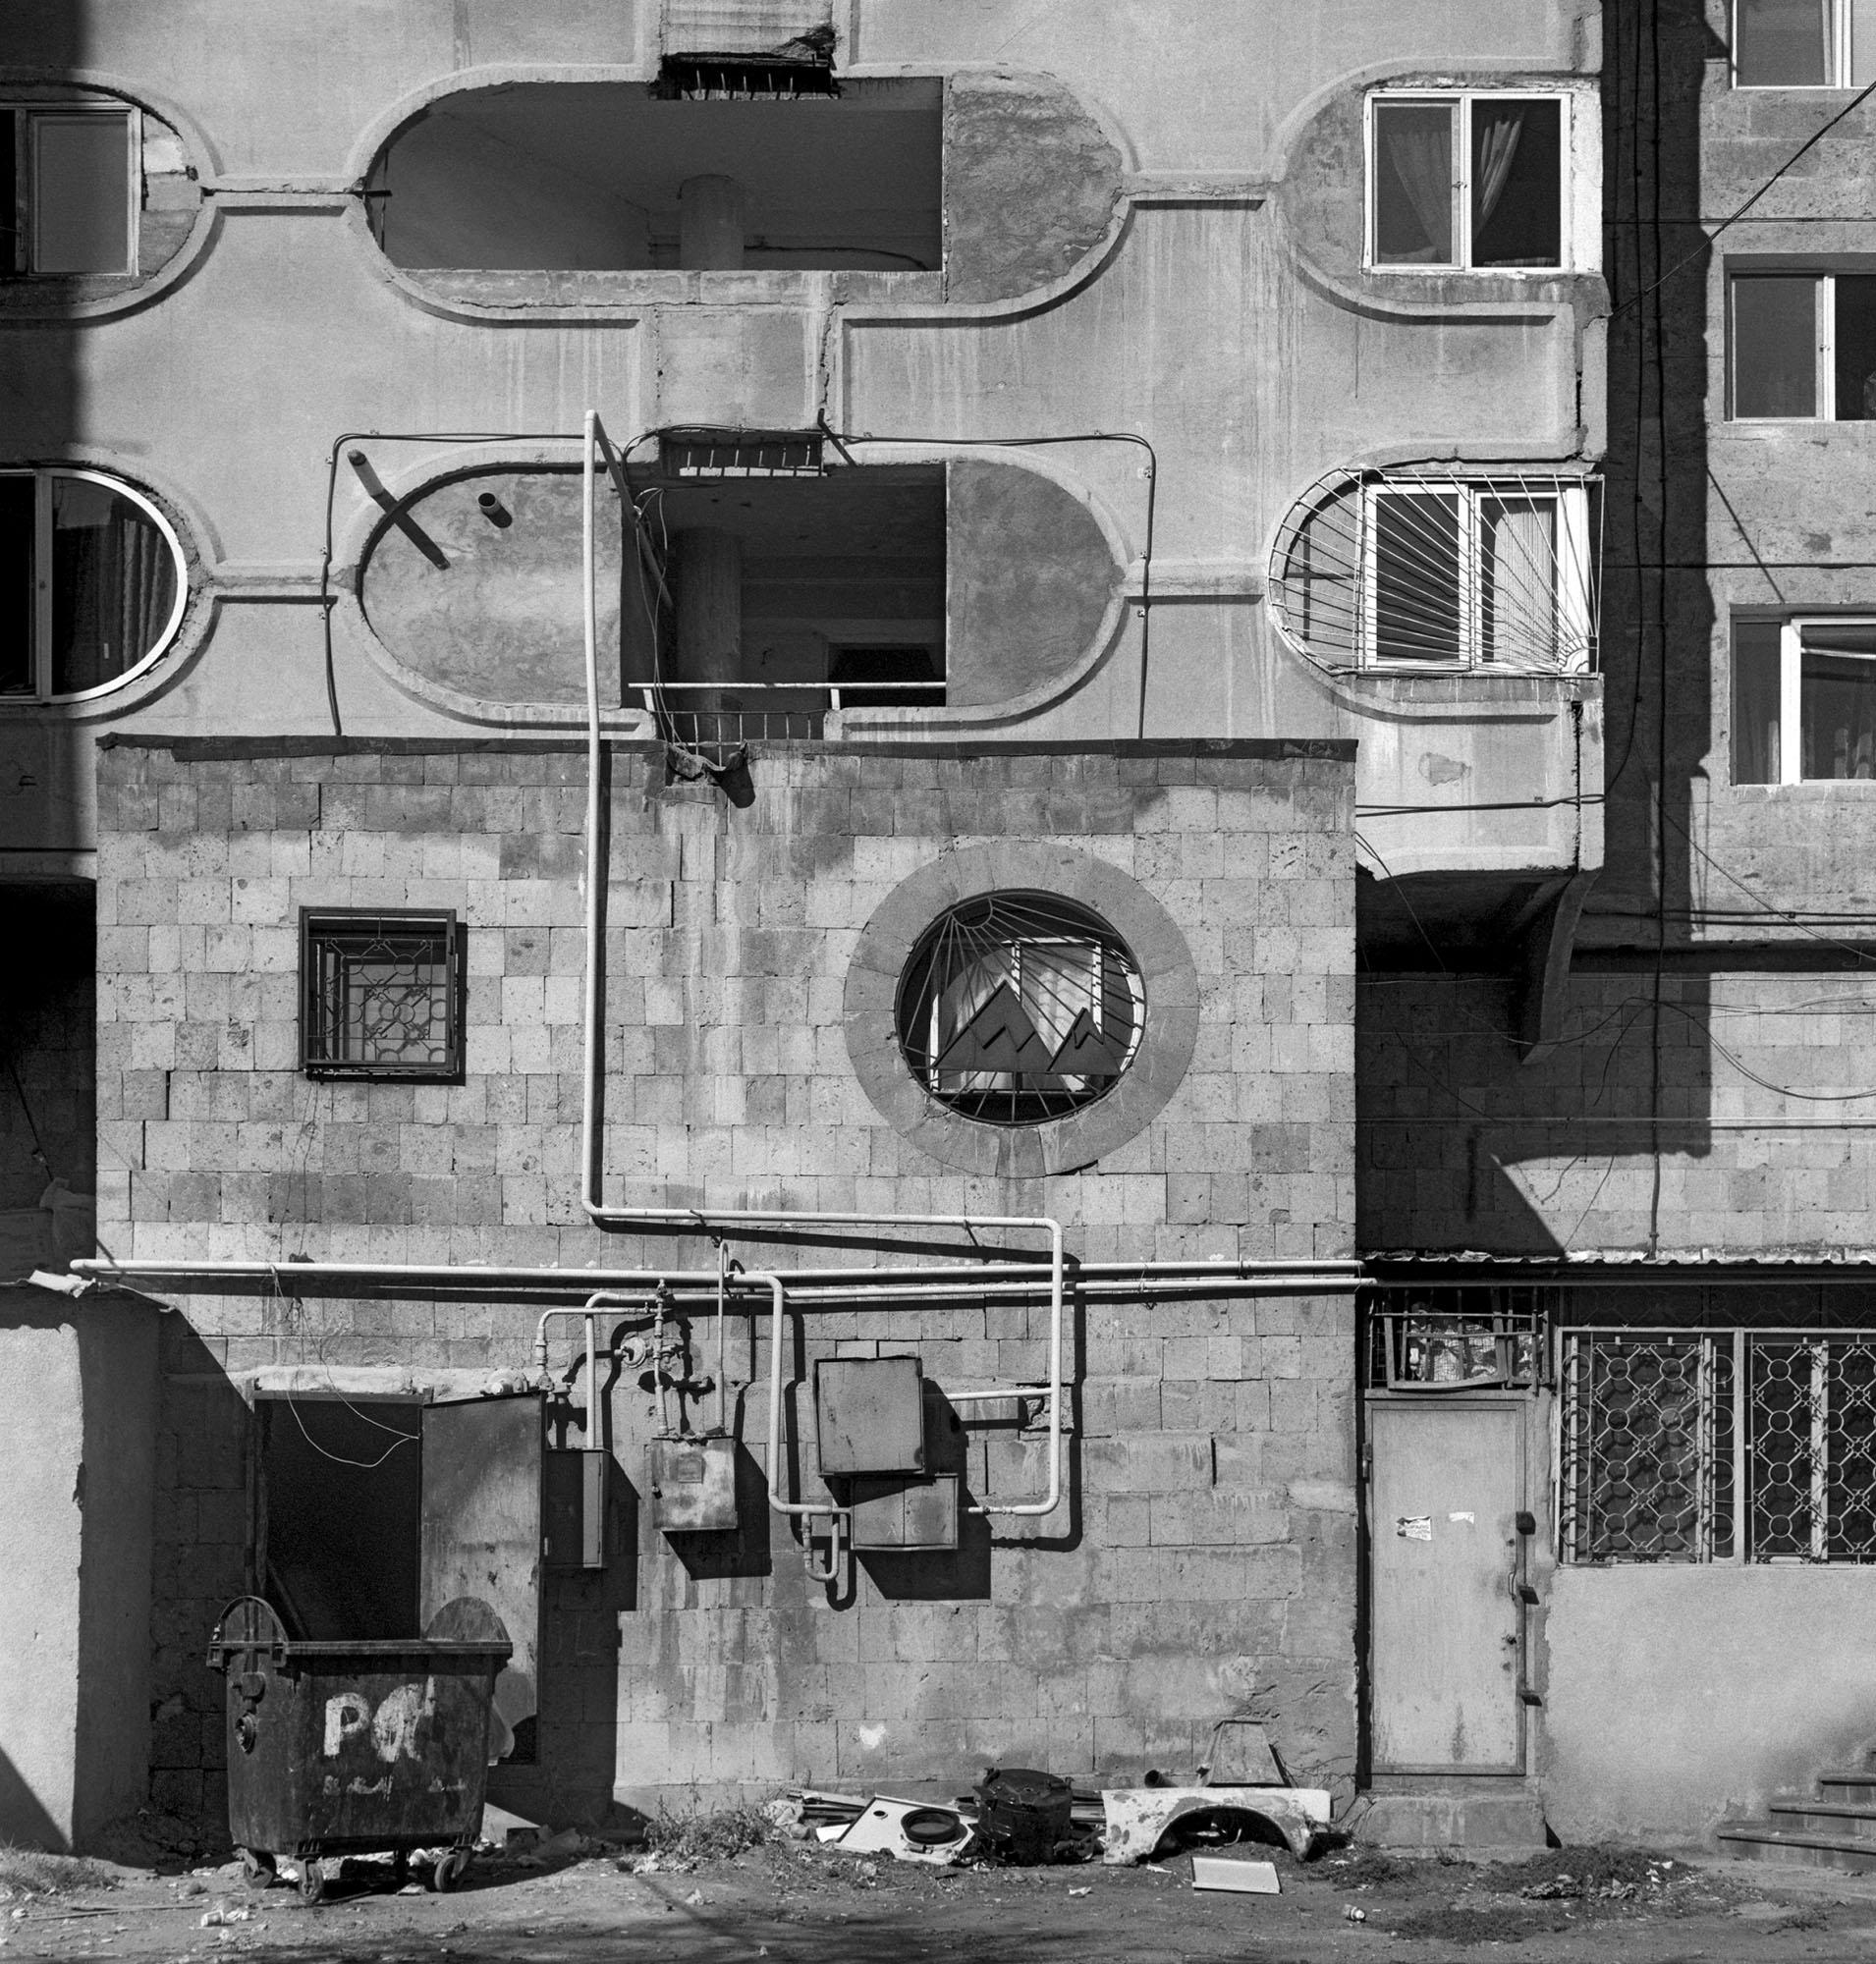 Fotó: Katharina Roters: Jereván, 2017 © Katharina Roters